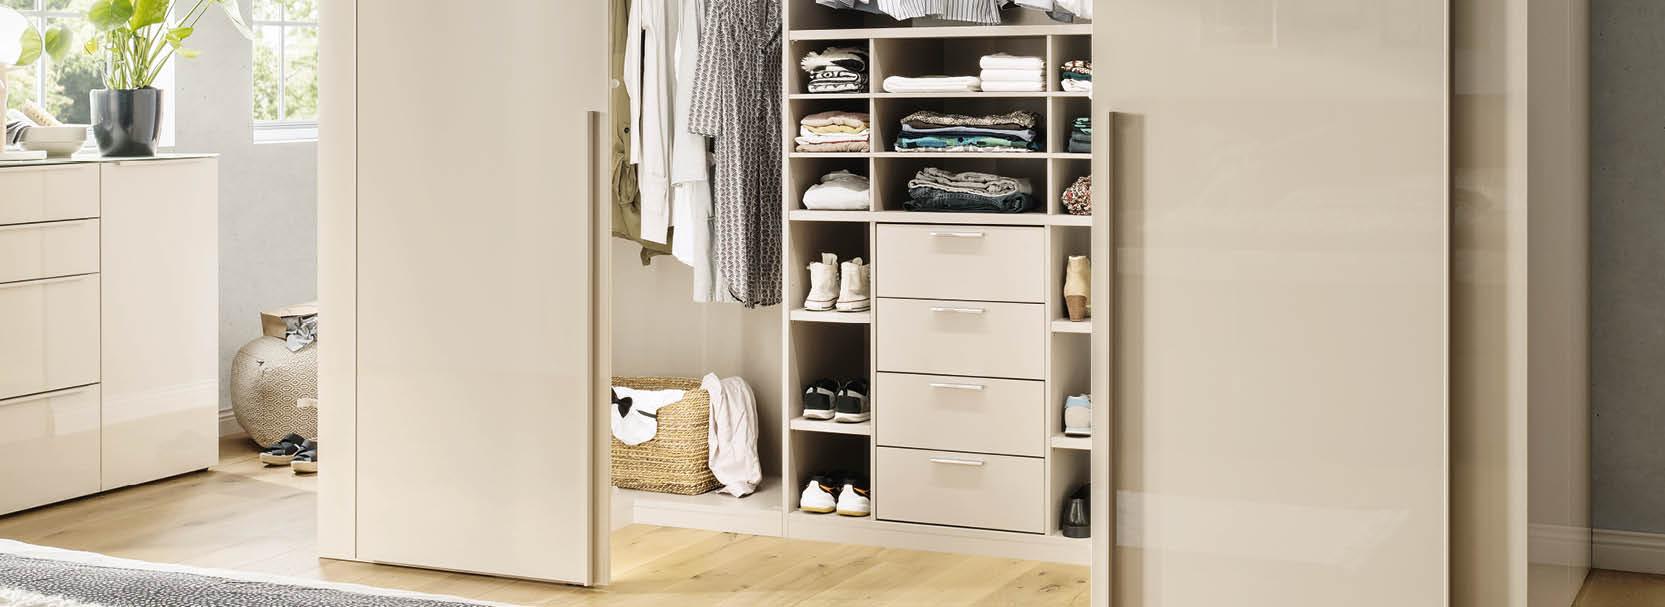 Begehbarer Kleiderschrank Global Linares 71312000001-2 - Global Möbel